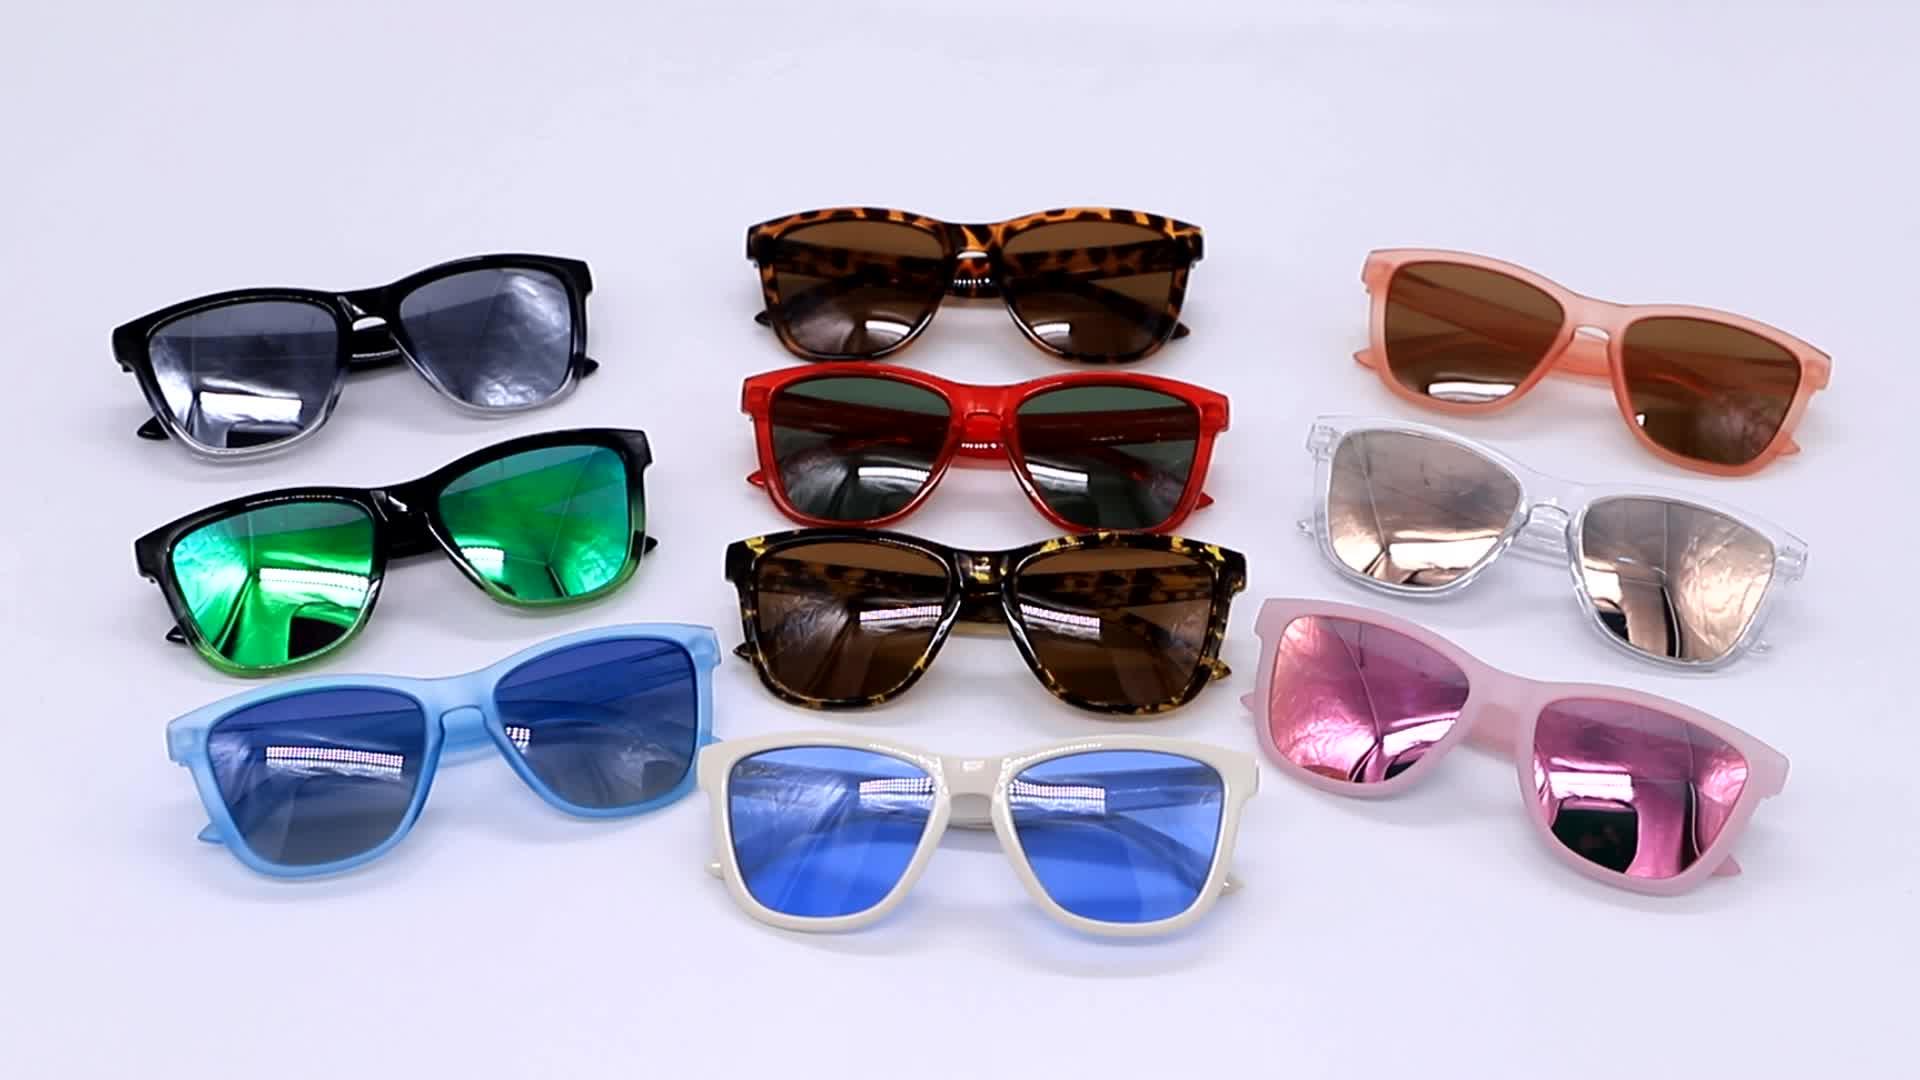 2020 New Arrivals Fashion Colorful Shades Sunglasses Womens With Cheap Polarized Lens Remove Leg Sun Glasses